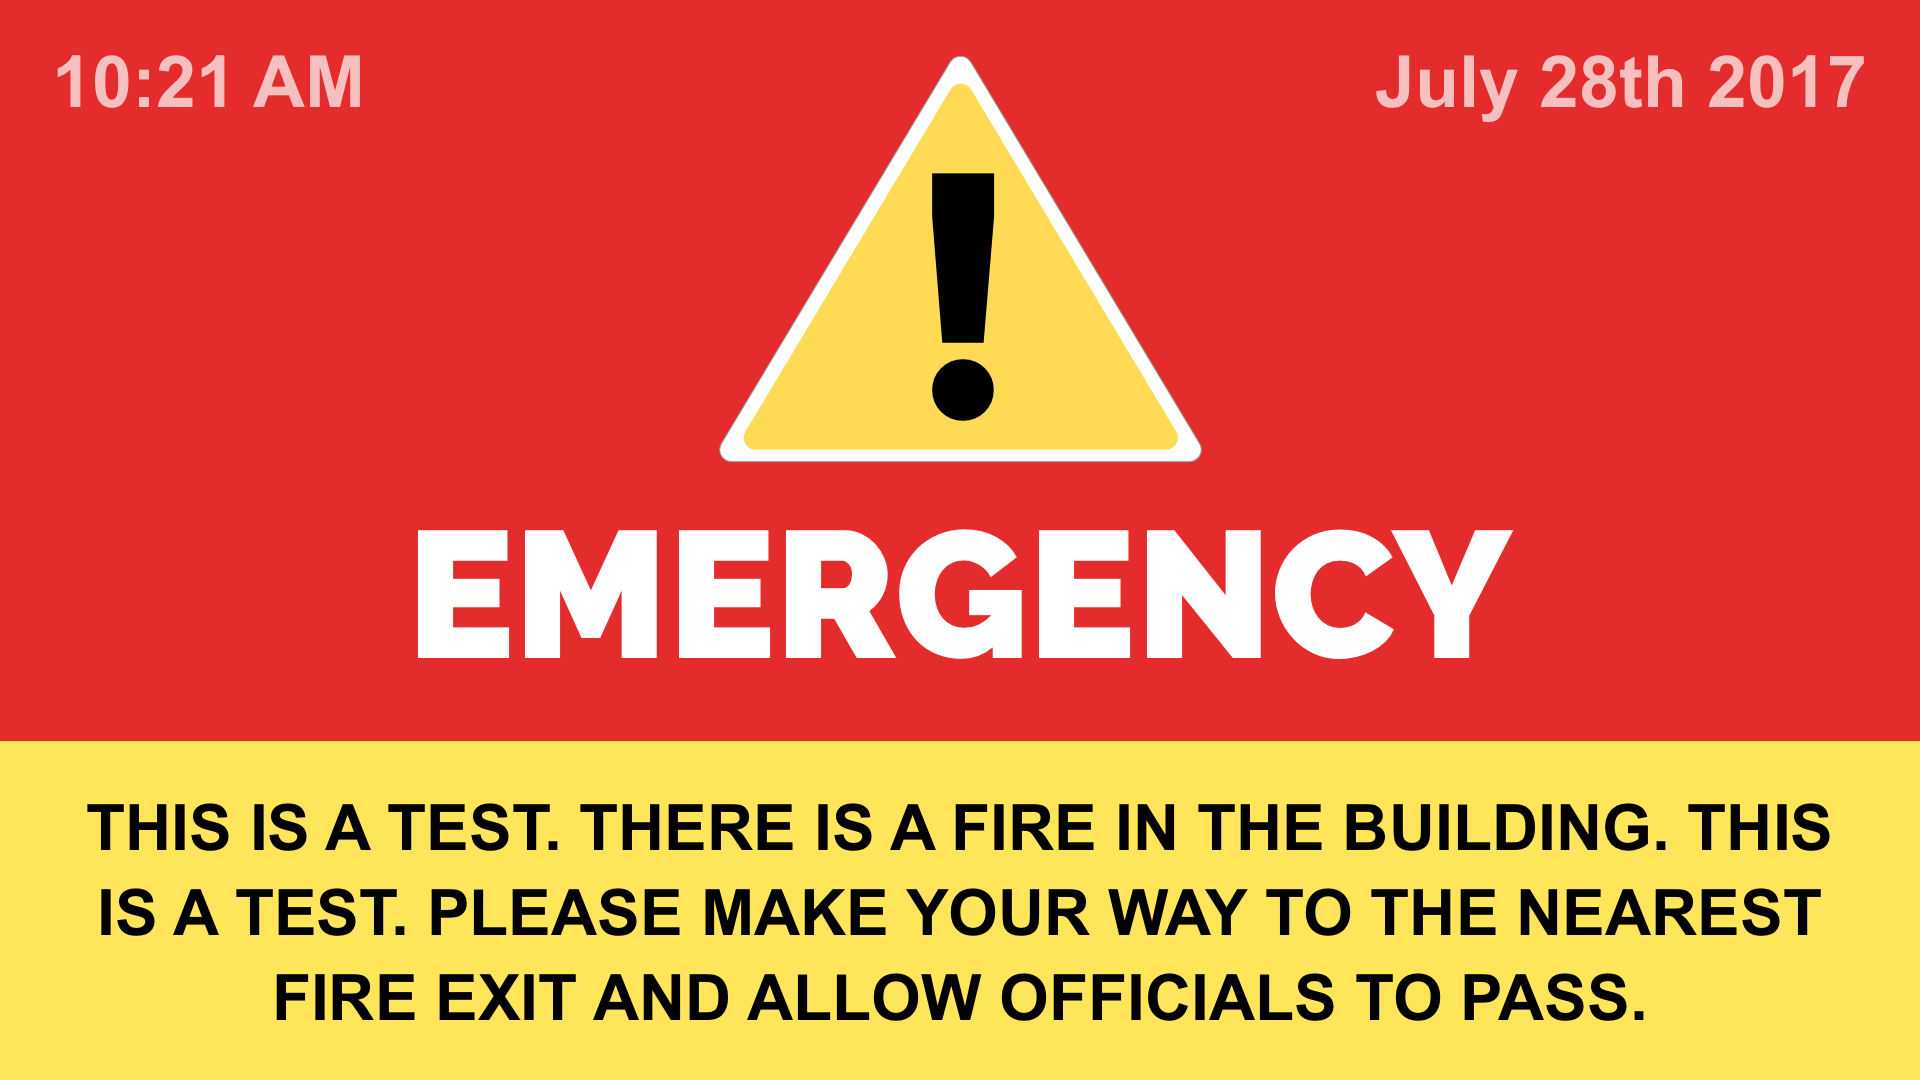 Emergency Notification Digital Signage Template